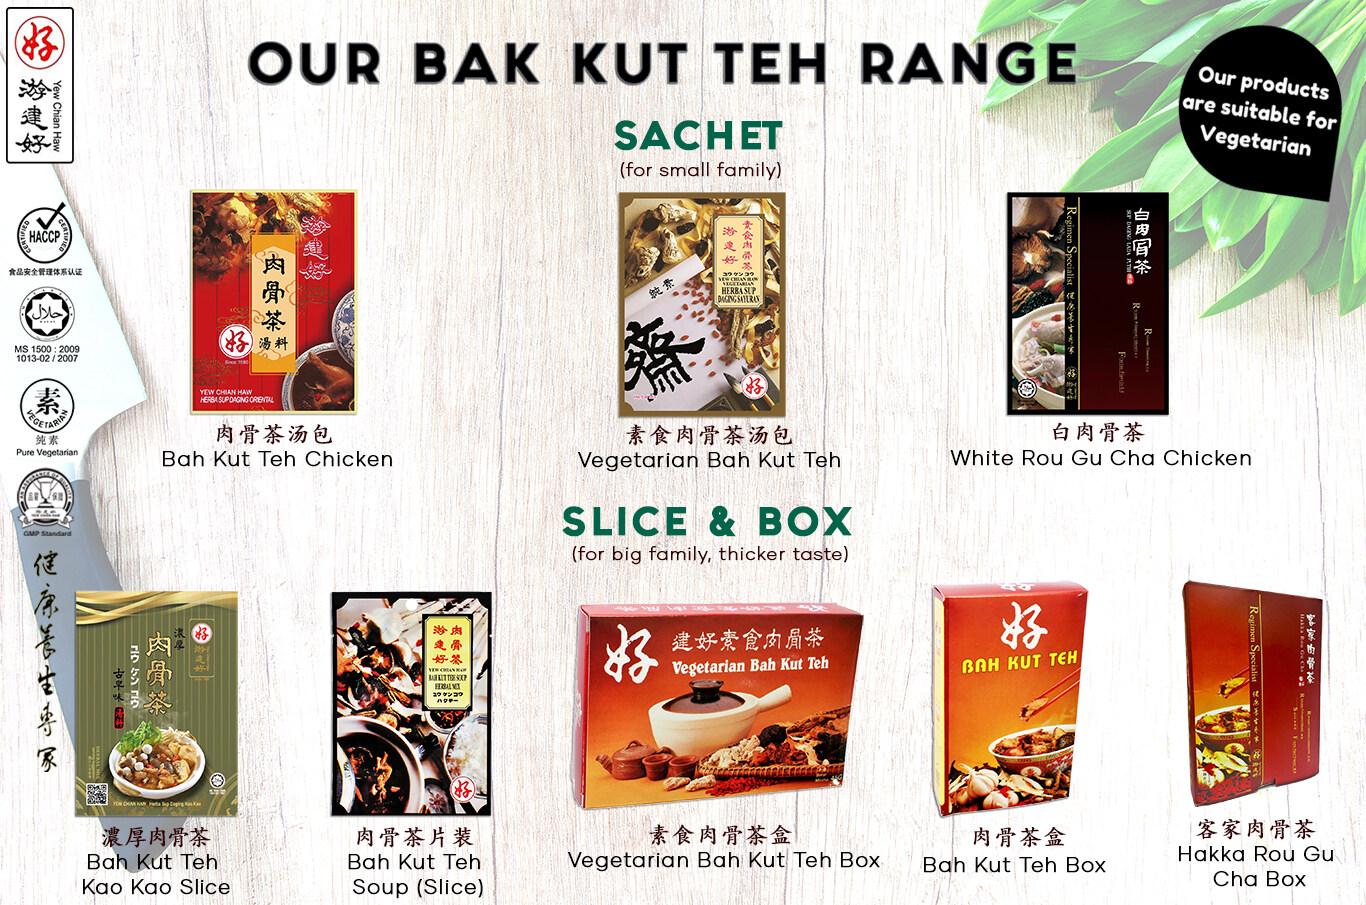 YCH Bah Kut Teh Sachet 50g Chicken Herbal Soup (3 years shelf life) herbs pack